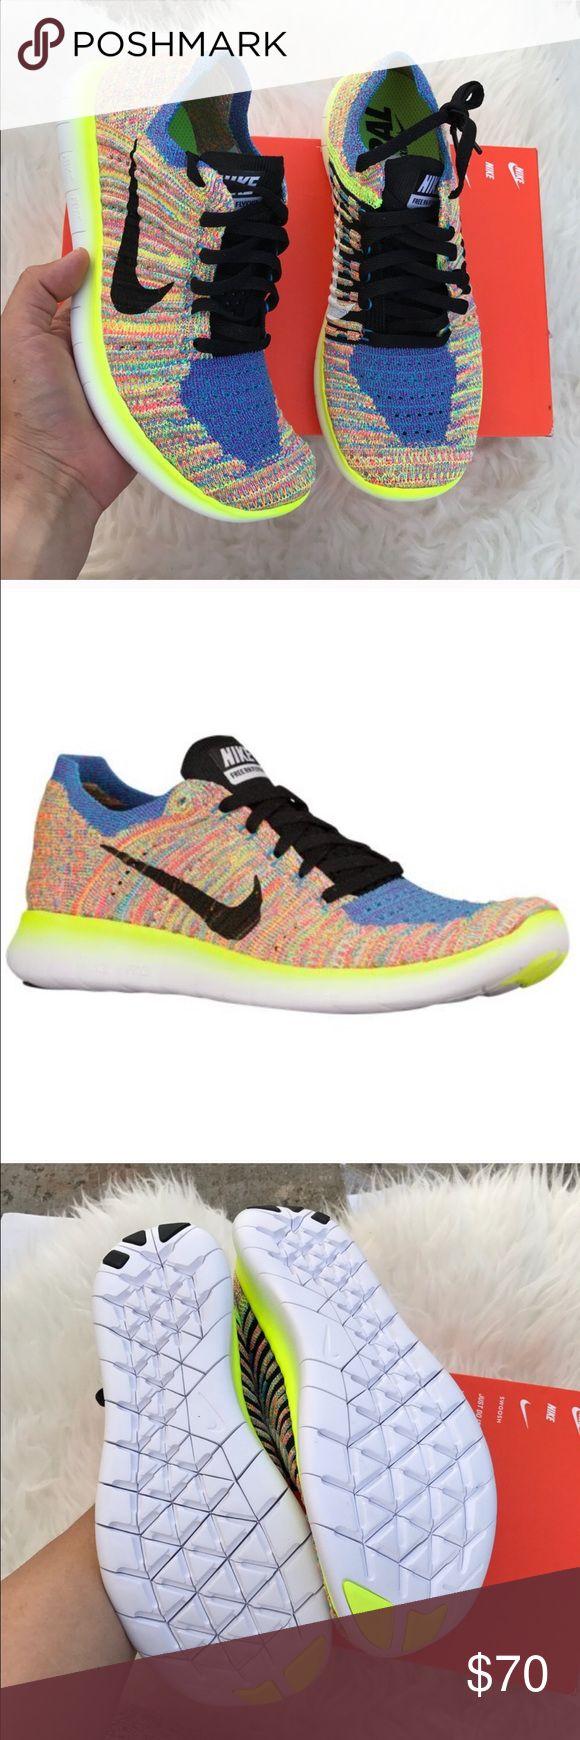 Nike womens free rn flyknit shoes sz 85 new nwt